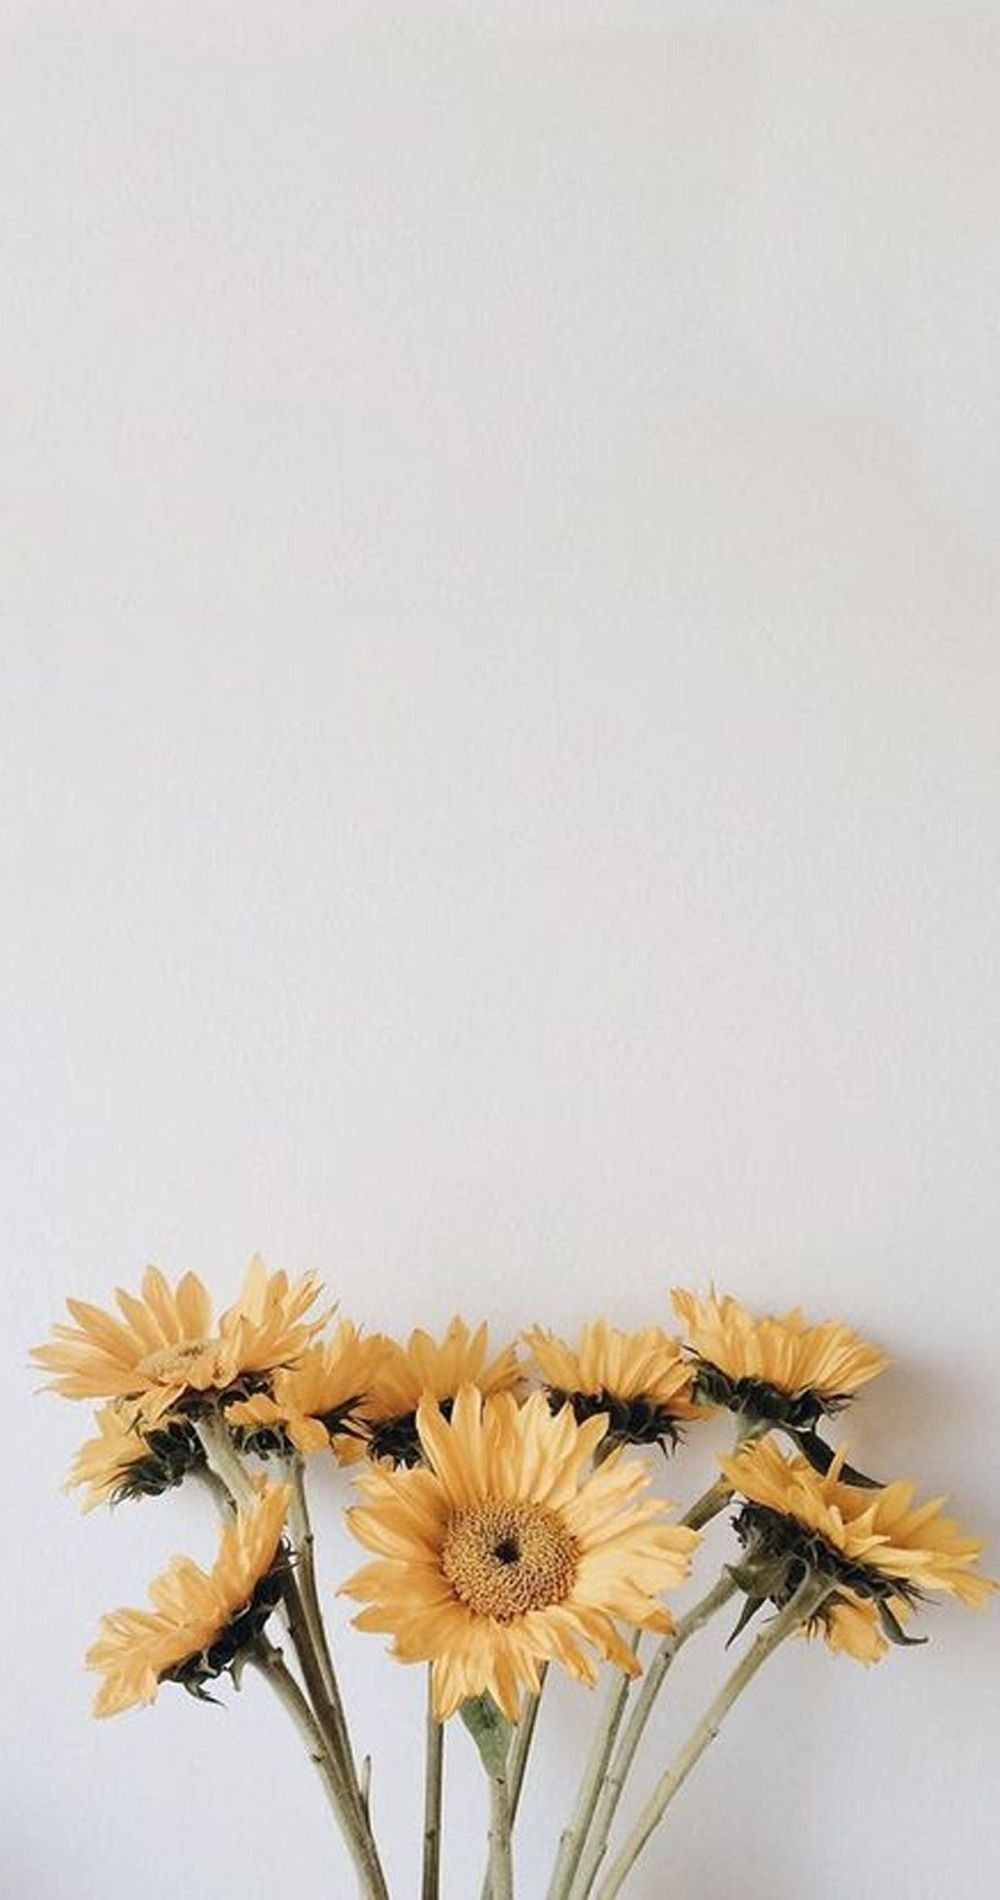 Ari & Rachel ♥ Photo: tumblr wallpapers ➵